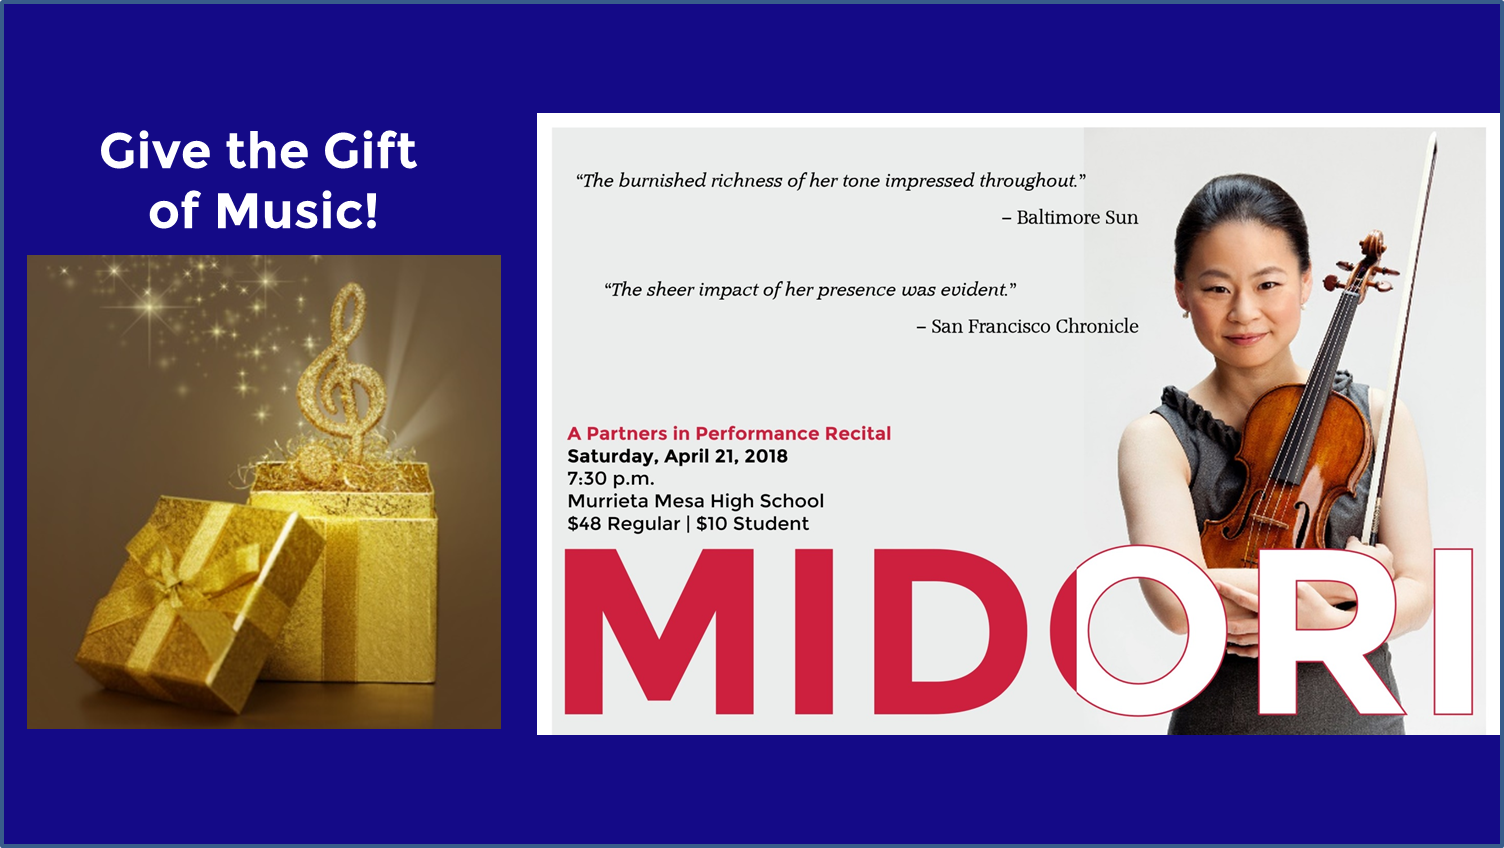 Midori_Gift